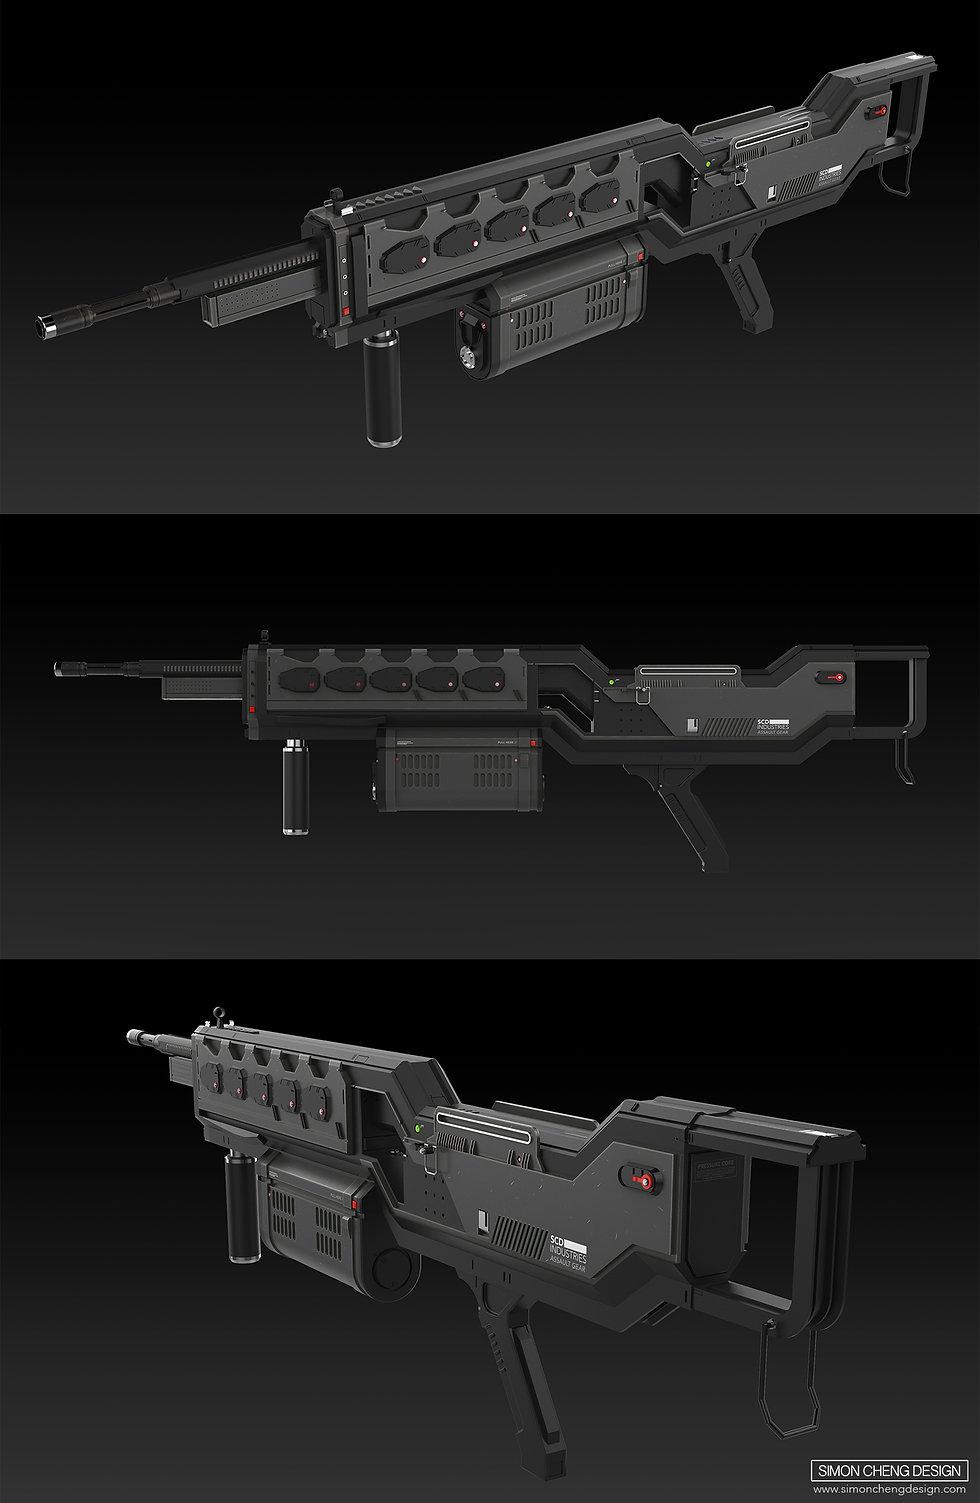 scd_weapon_034.jpg